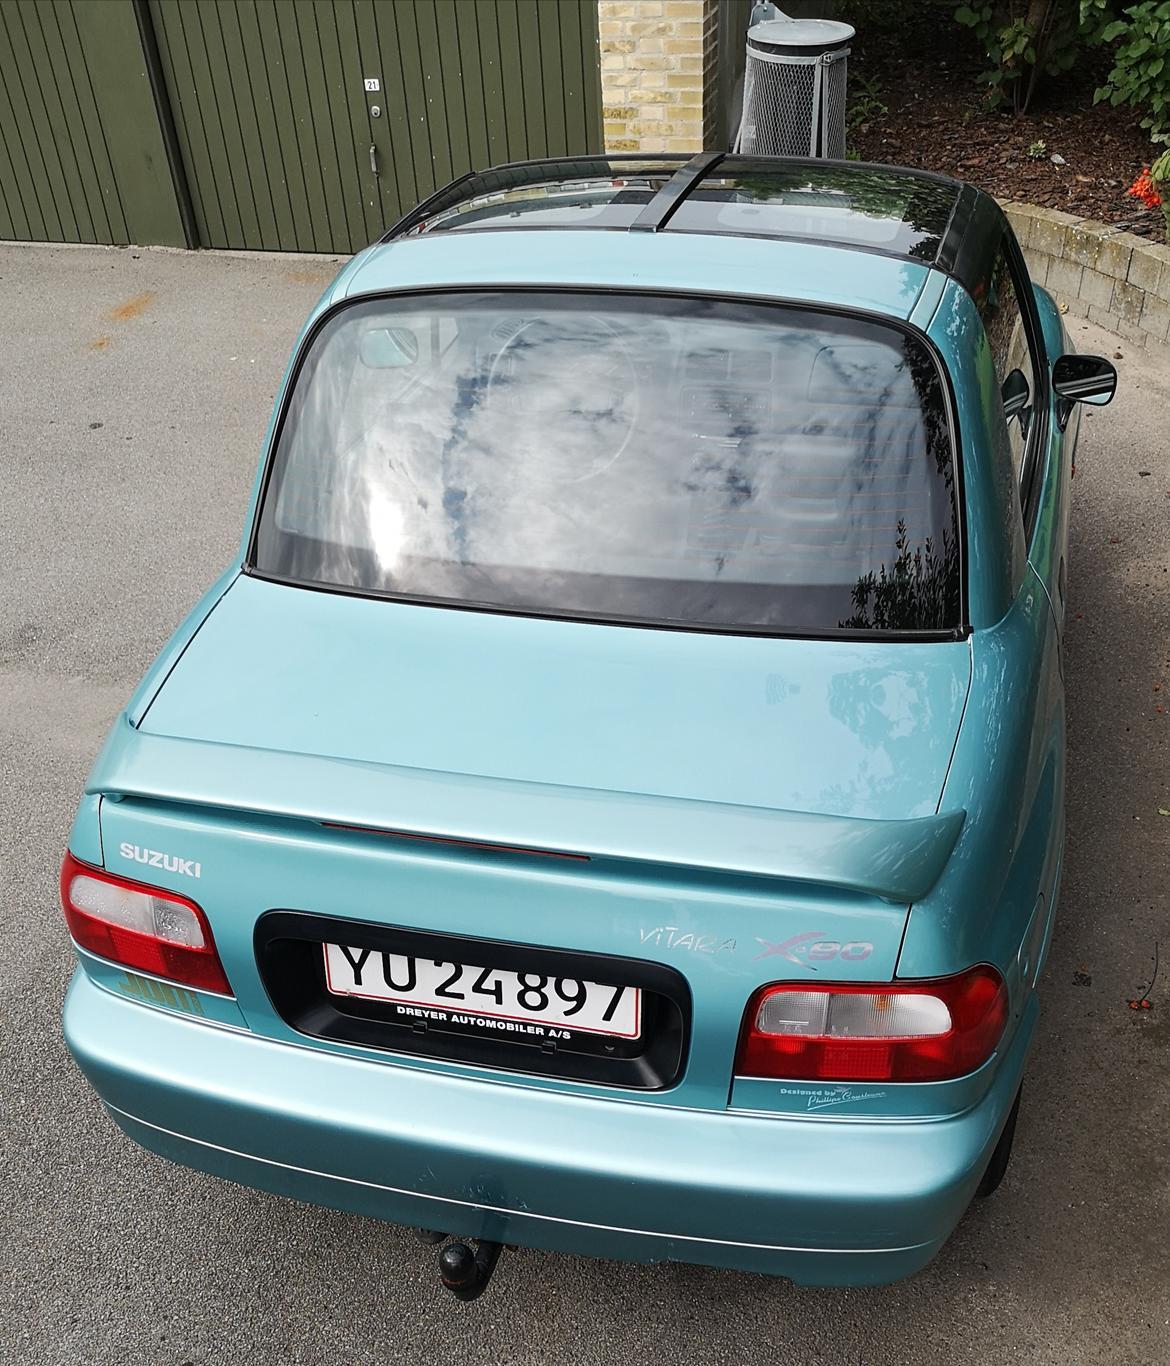 Suzuki Vitara X90 (SZ416) 1,6 4x4  billede 6